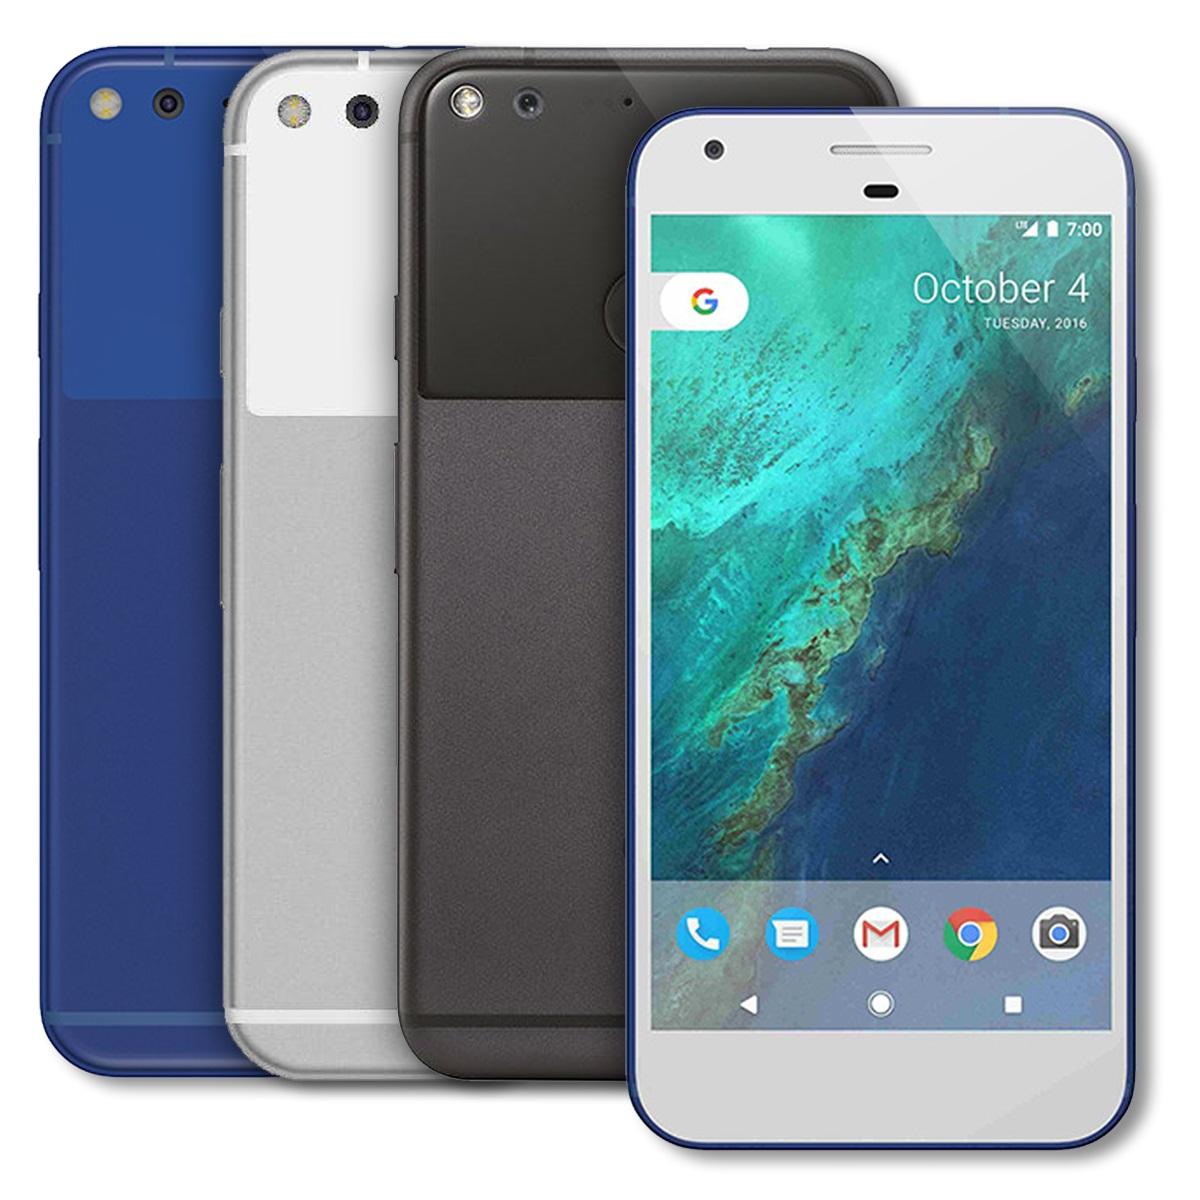 Google Pixel 32GB 4G LTE Android Smartphone Verizon